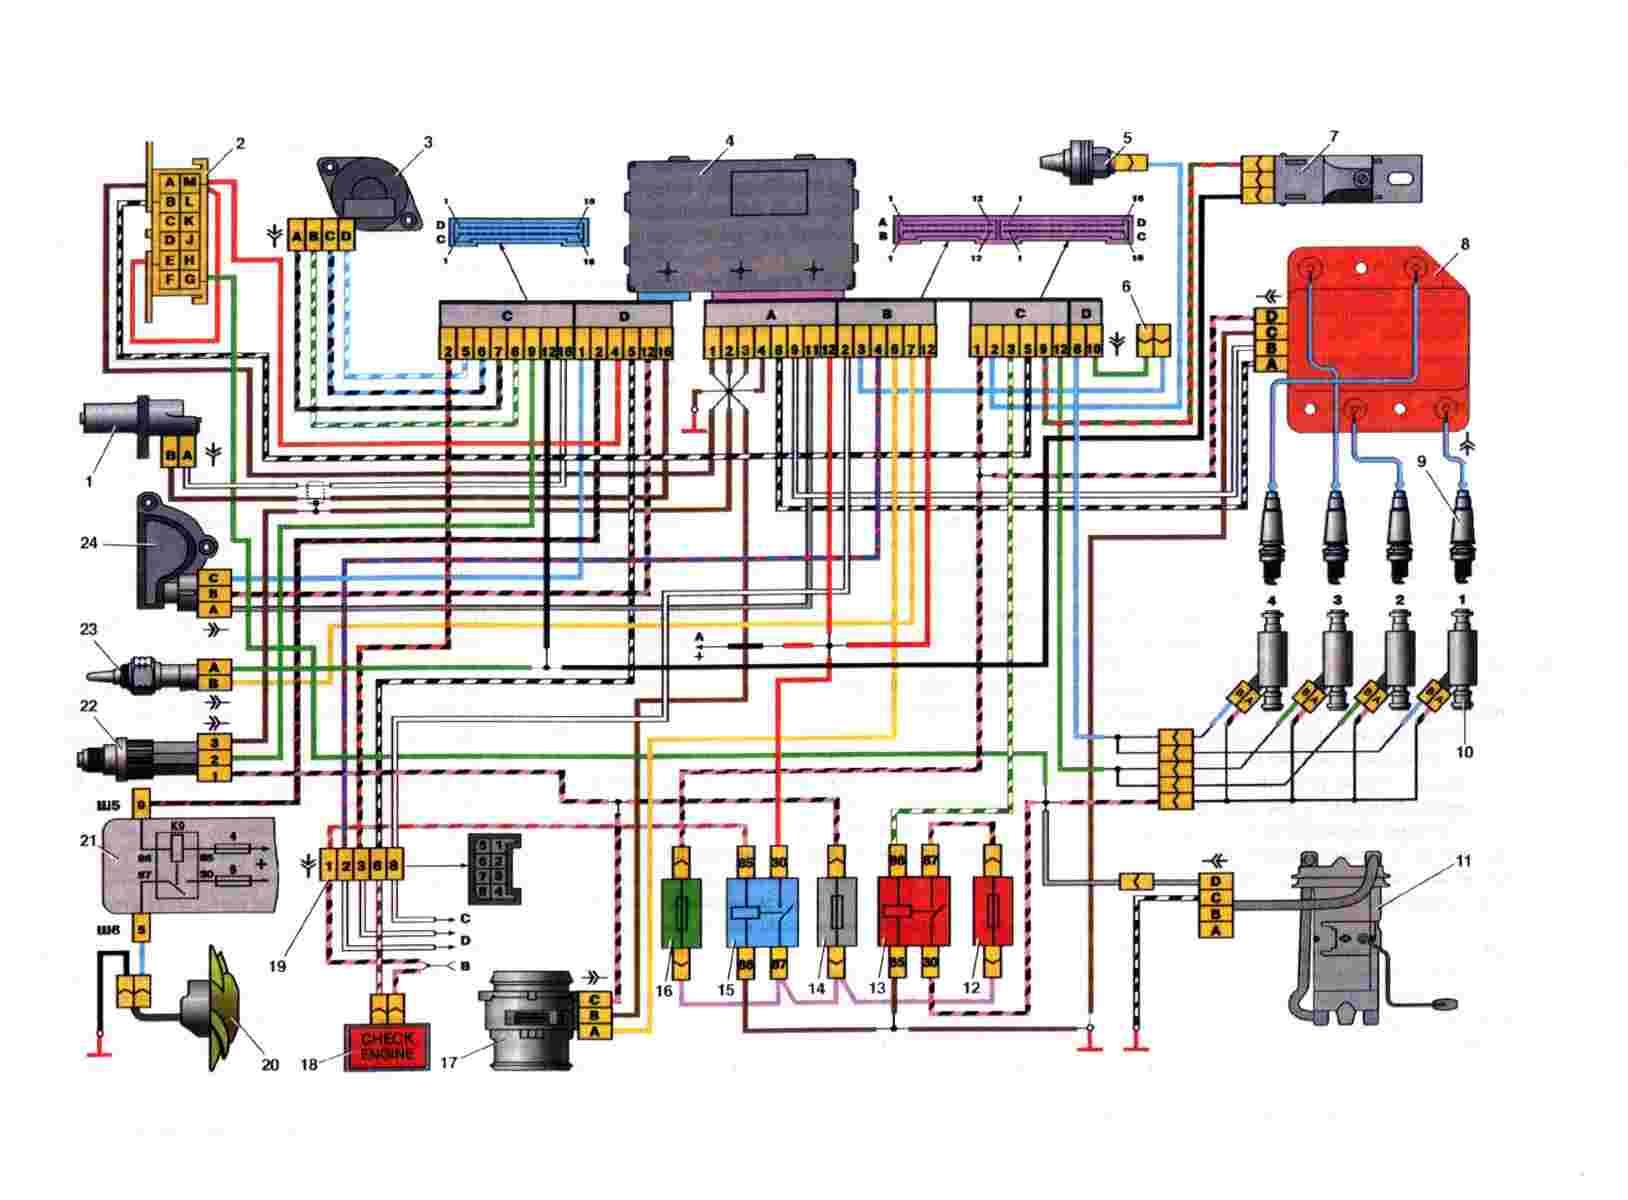 Фото №8 - ВАЗ 2110 инжектор схема